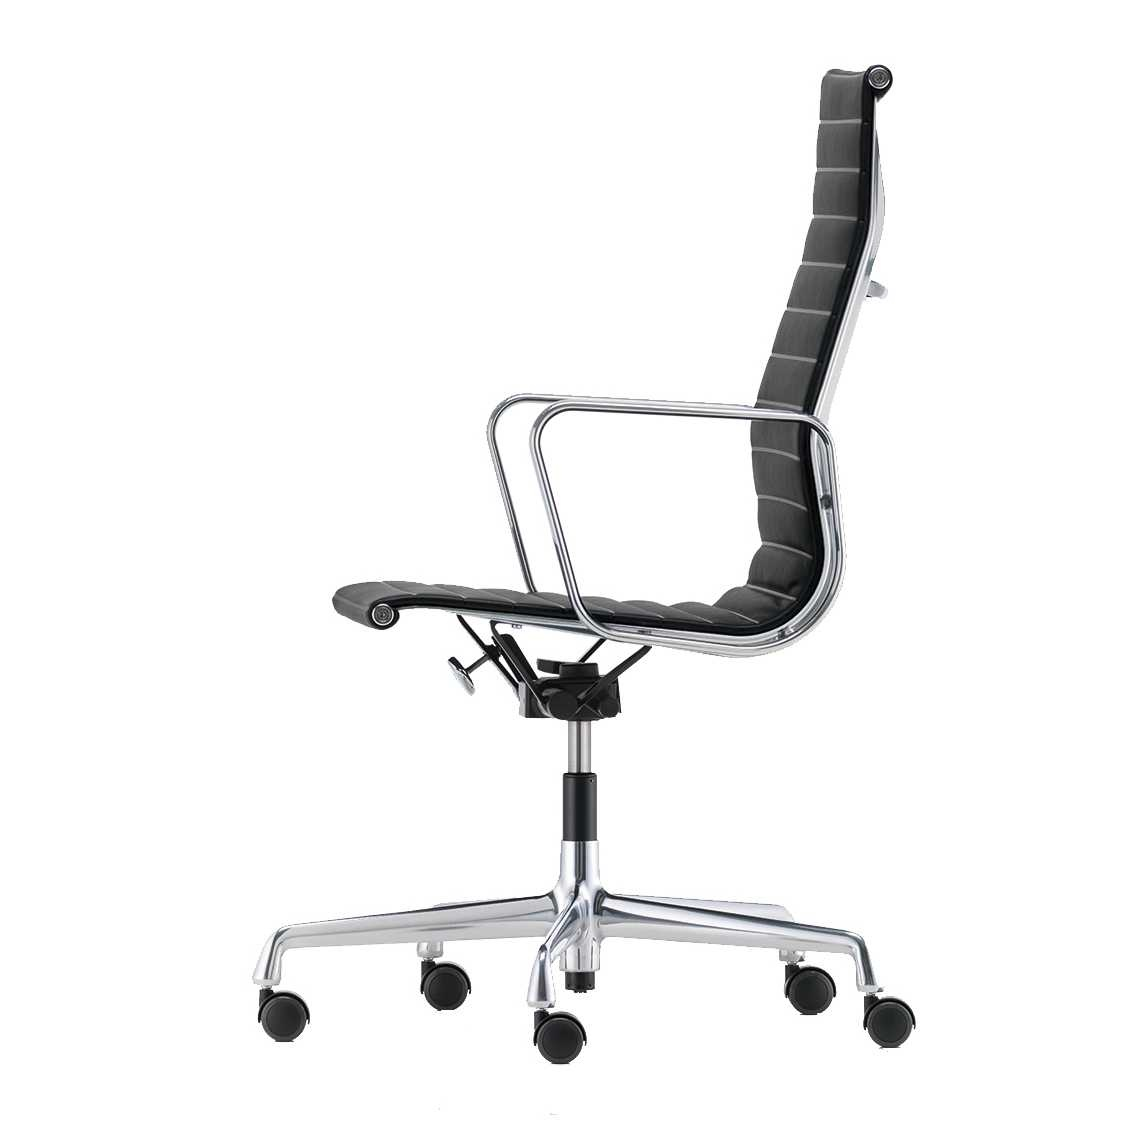 Charles Eames Vitra Bureaustoel.Vitra Aluminium Chair Ea 119 Nordic New